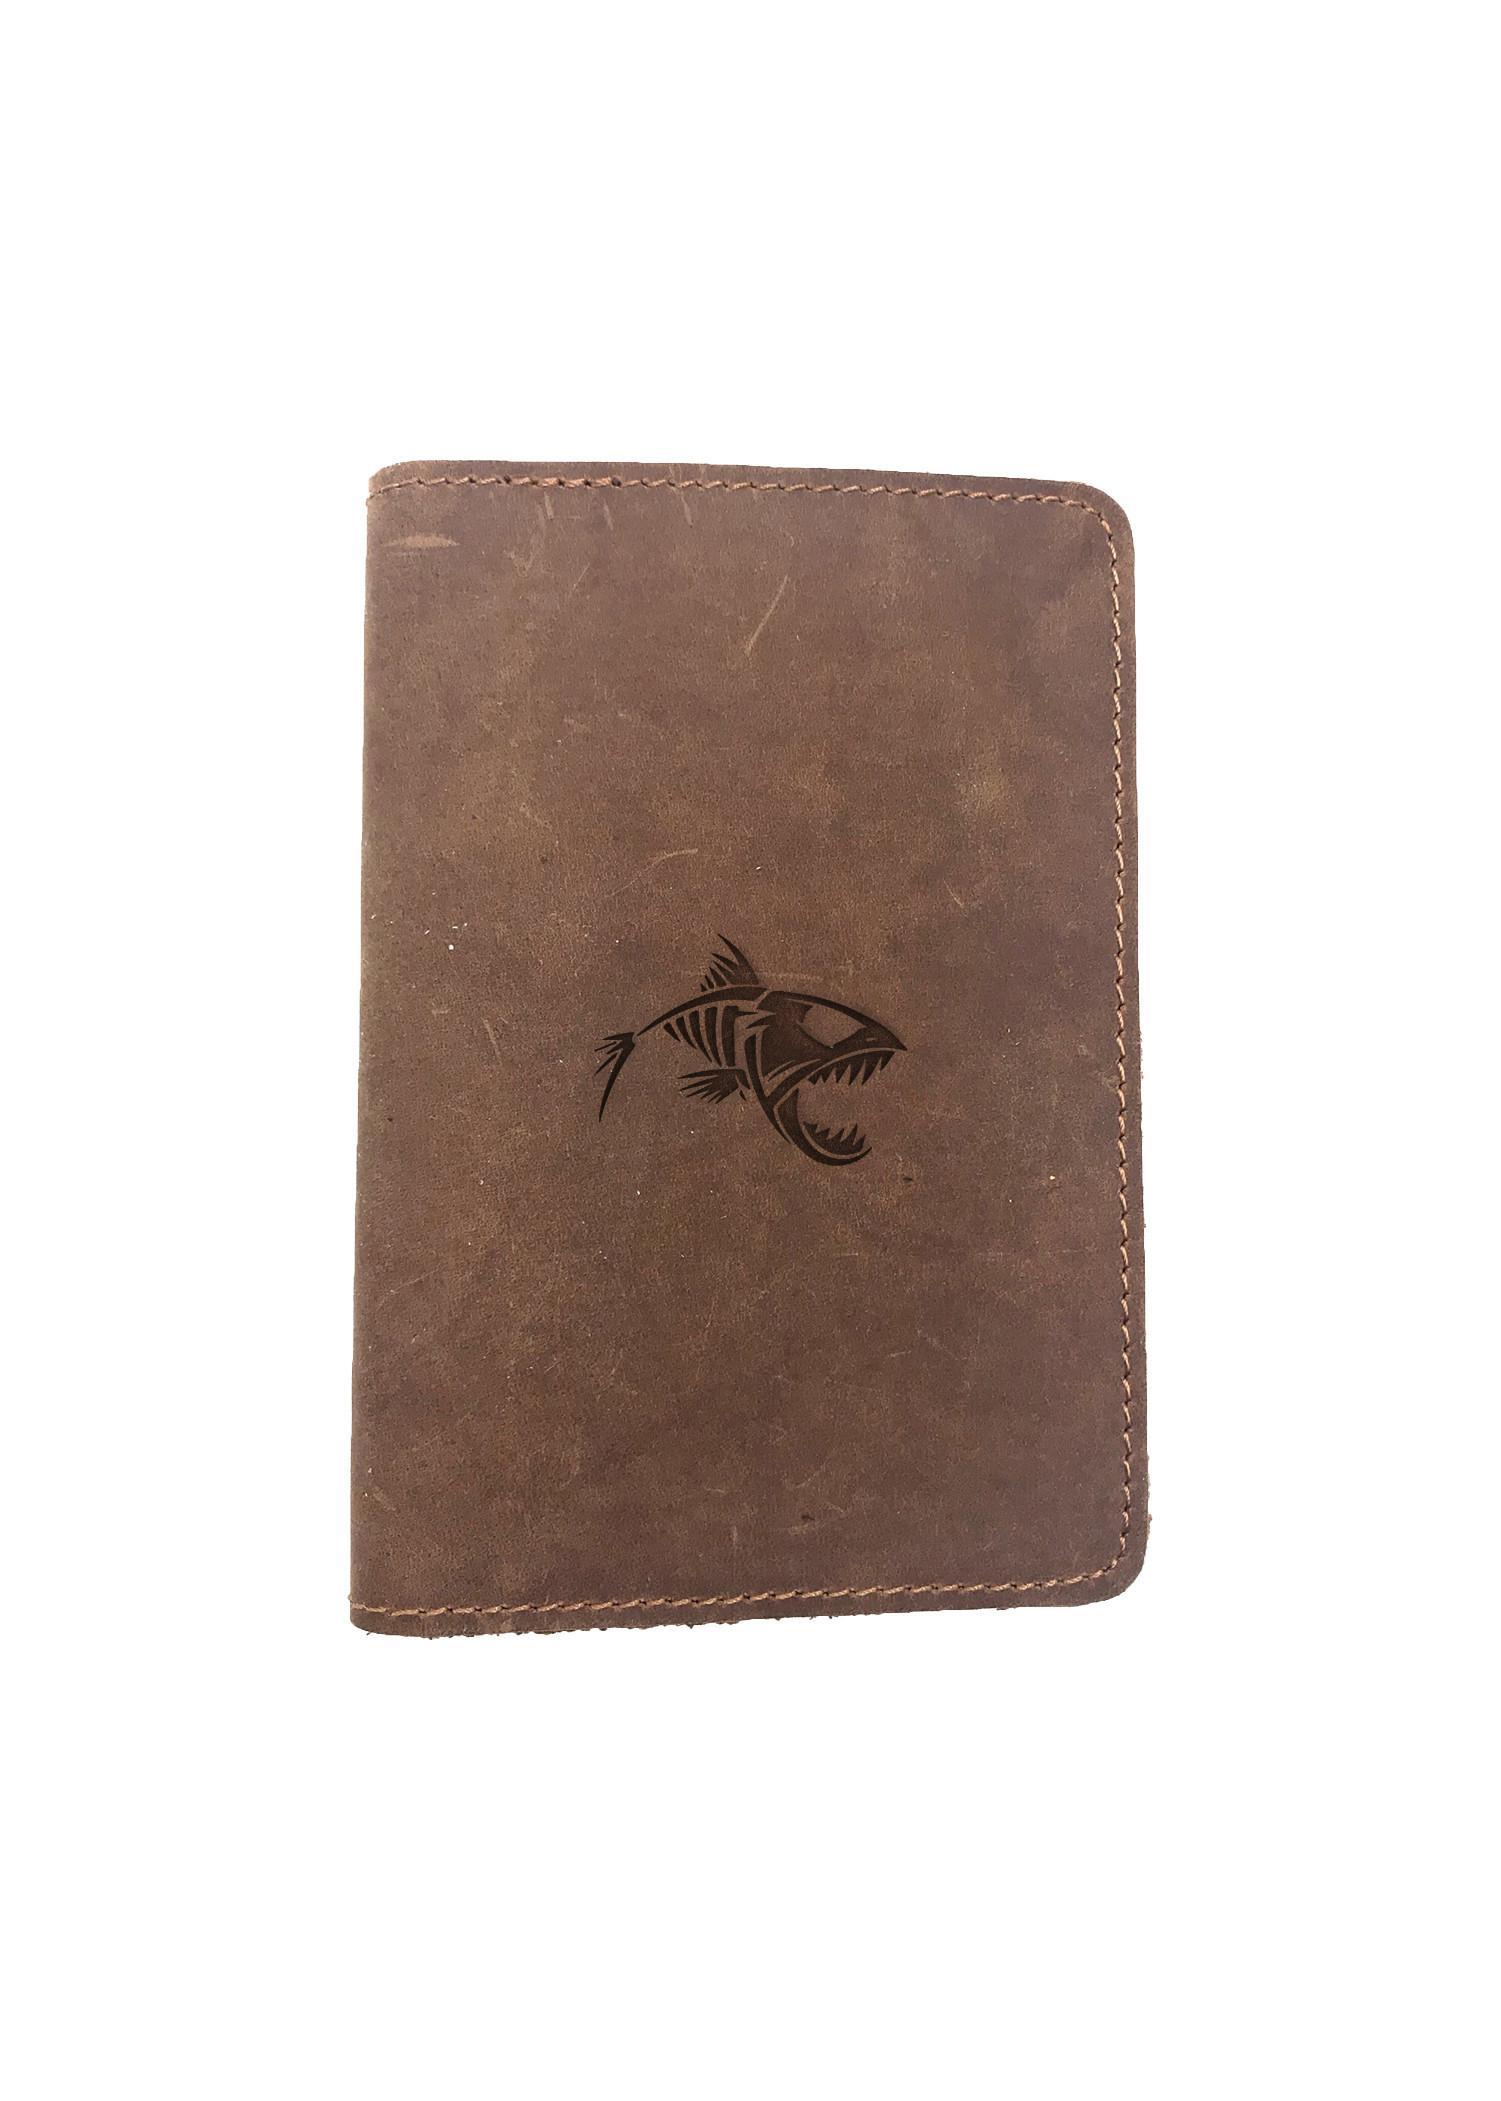 Passport Cover Bao Da Hộ Chiếu Da Sáp Khắc Hình Cá SKELETON FISH (BROWN)